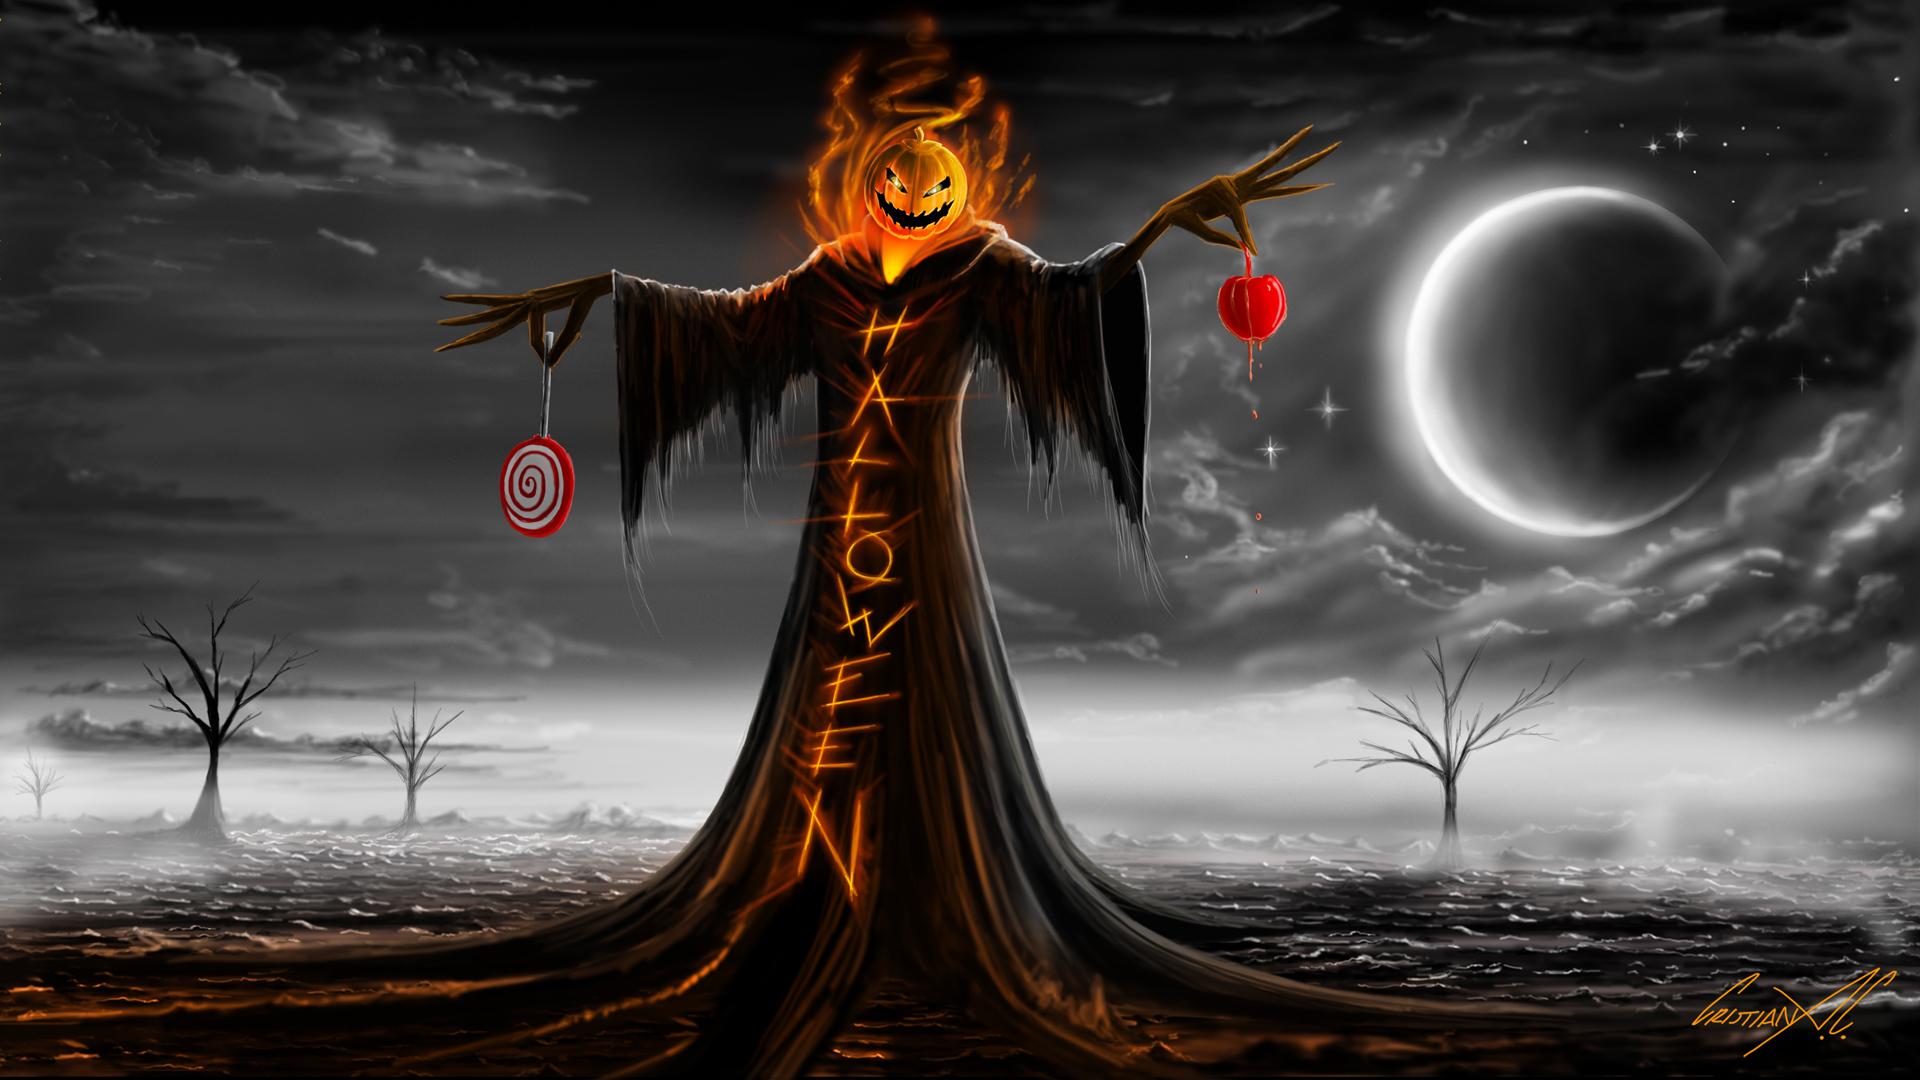 halloween wallpaper desktop hd